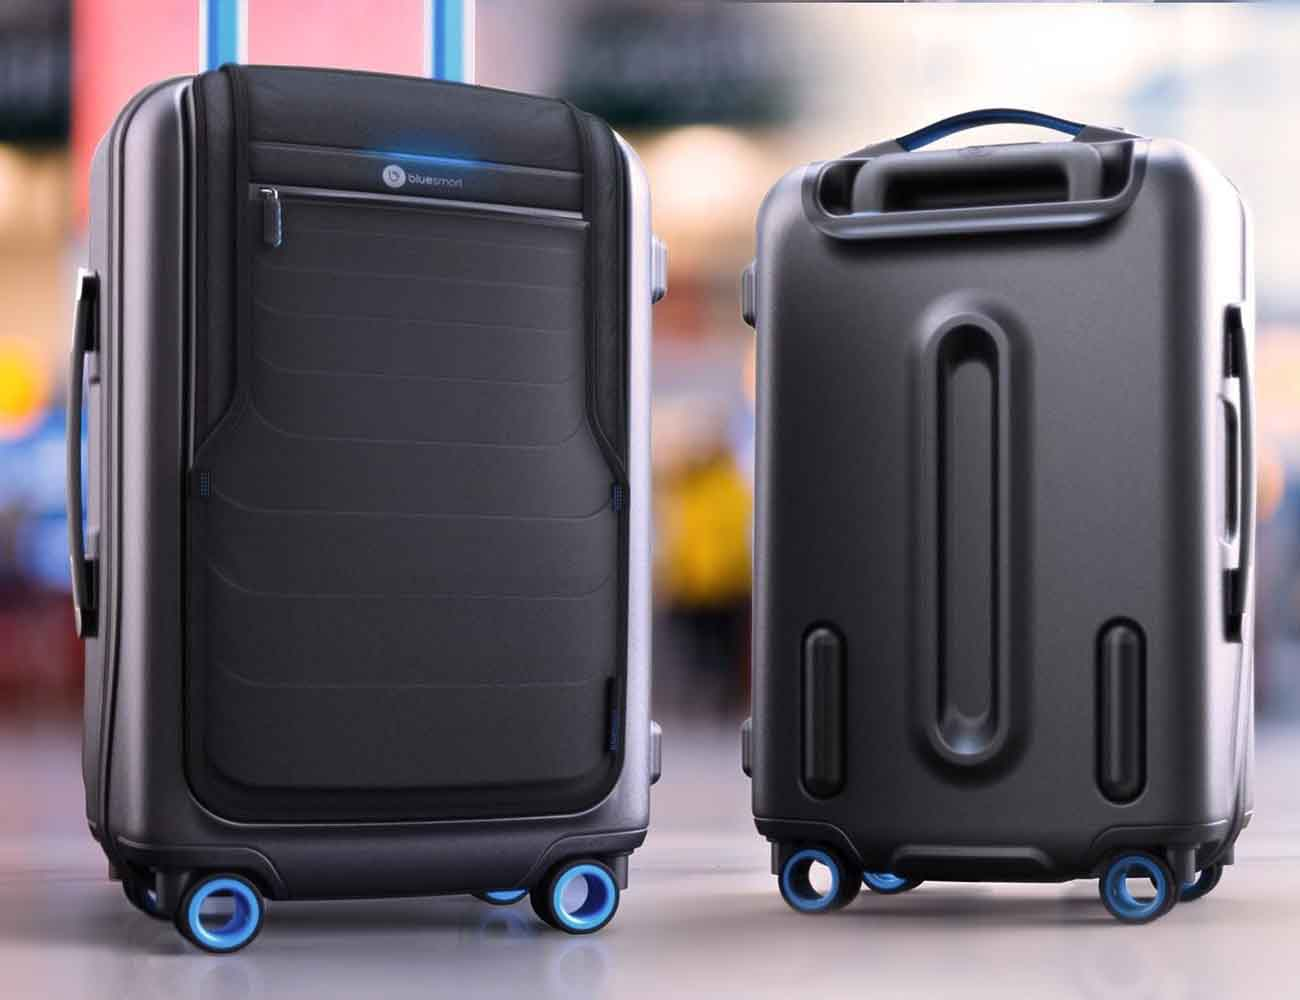 Bluesmart World S First Smart Luggage